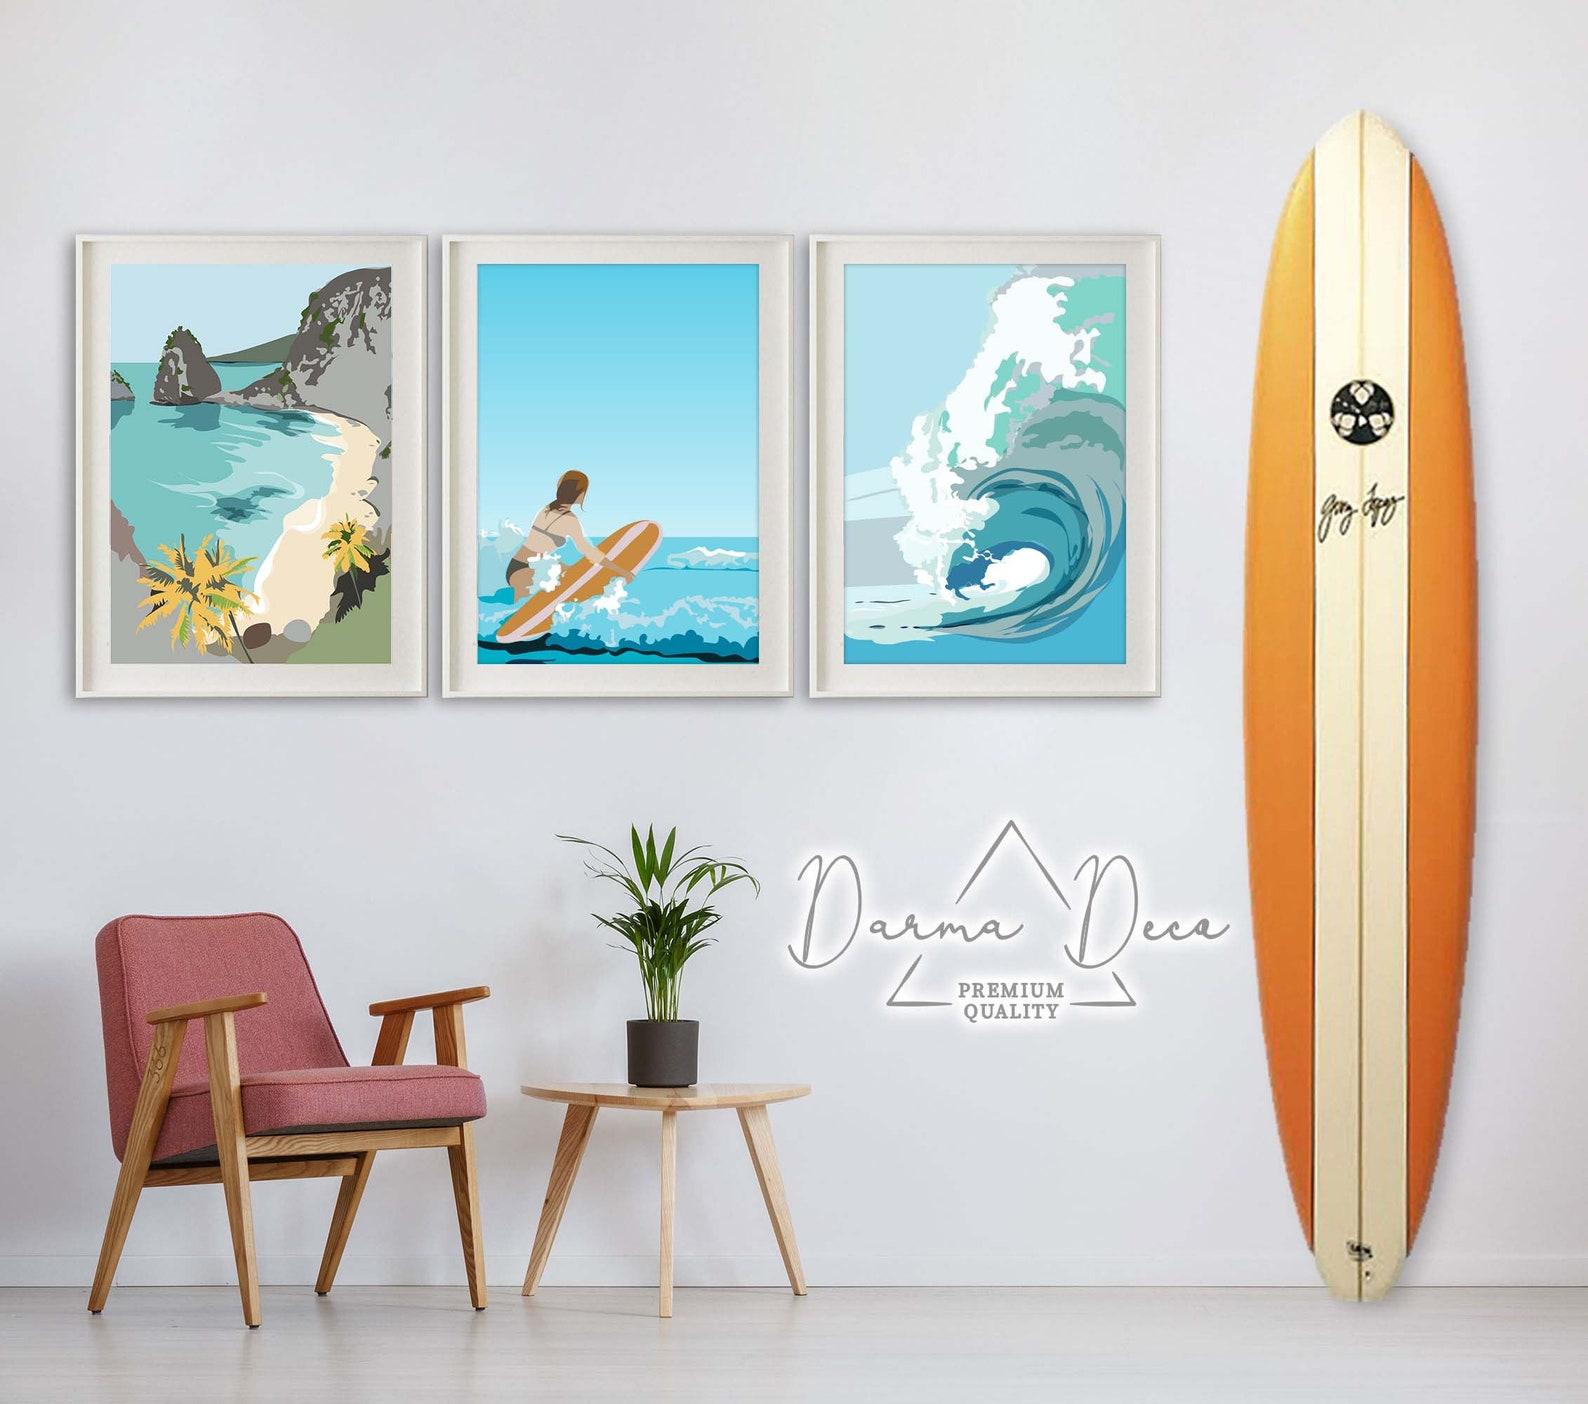 Tropical wall art makes the best Hawaiian souvenirs